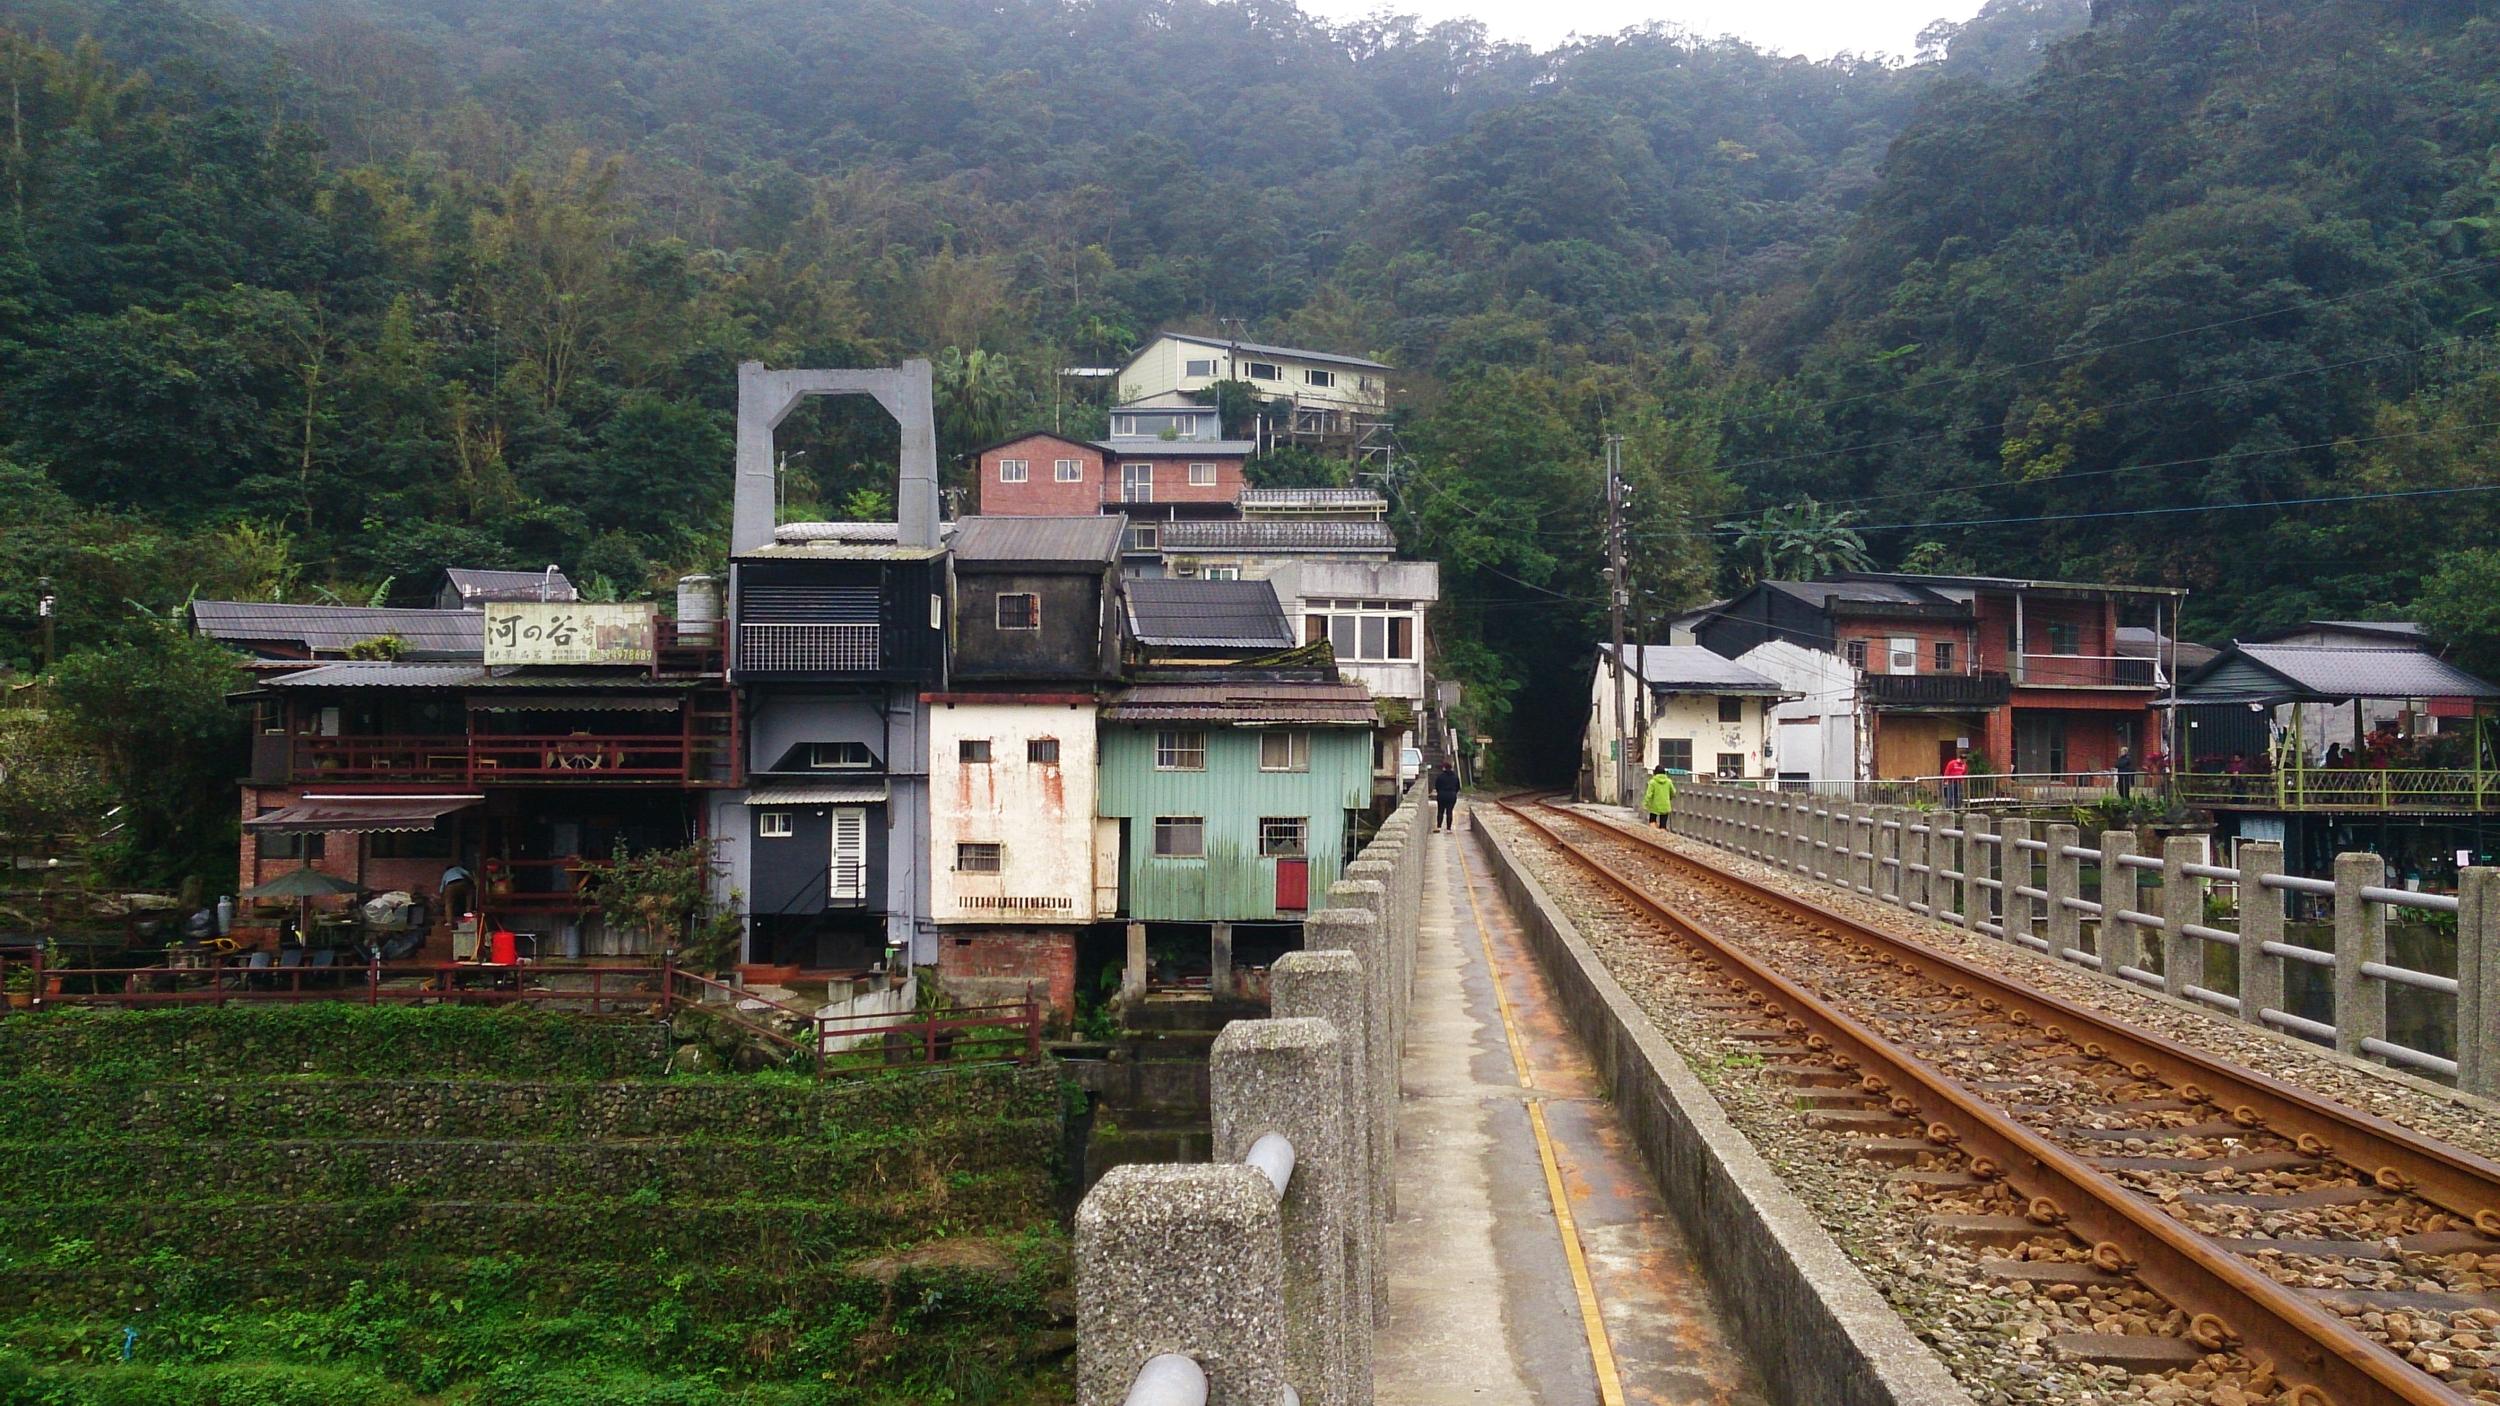 Sandiaoling Village (built around the piers of an old suspension bridge).